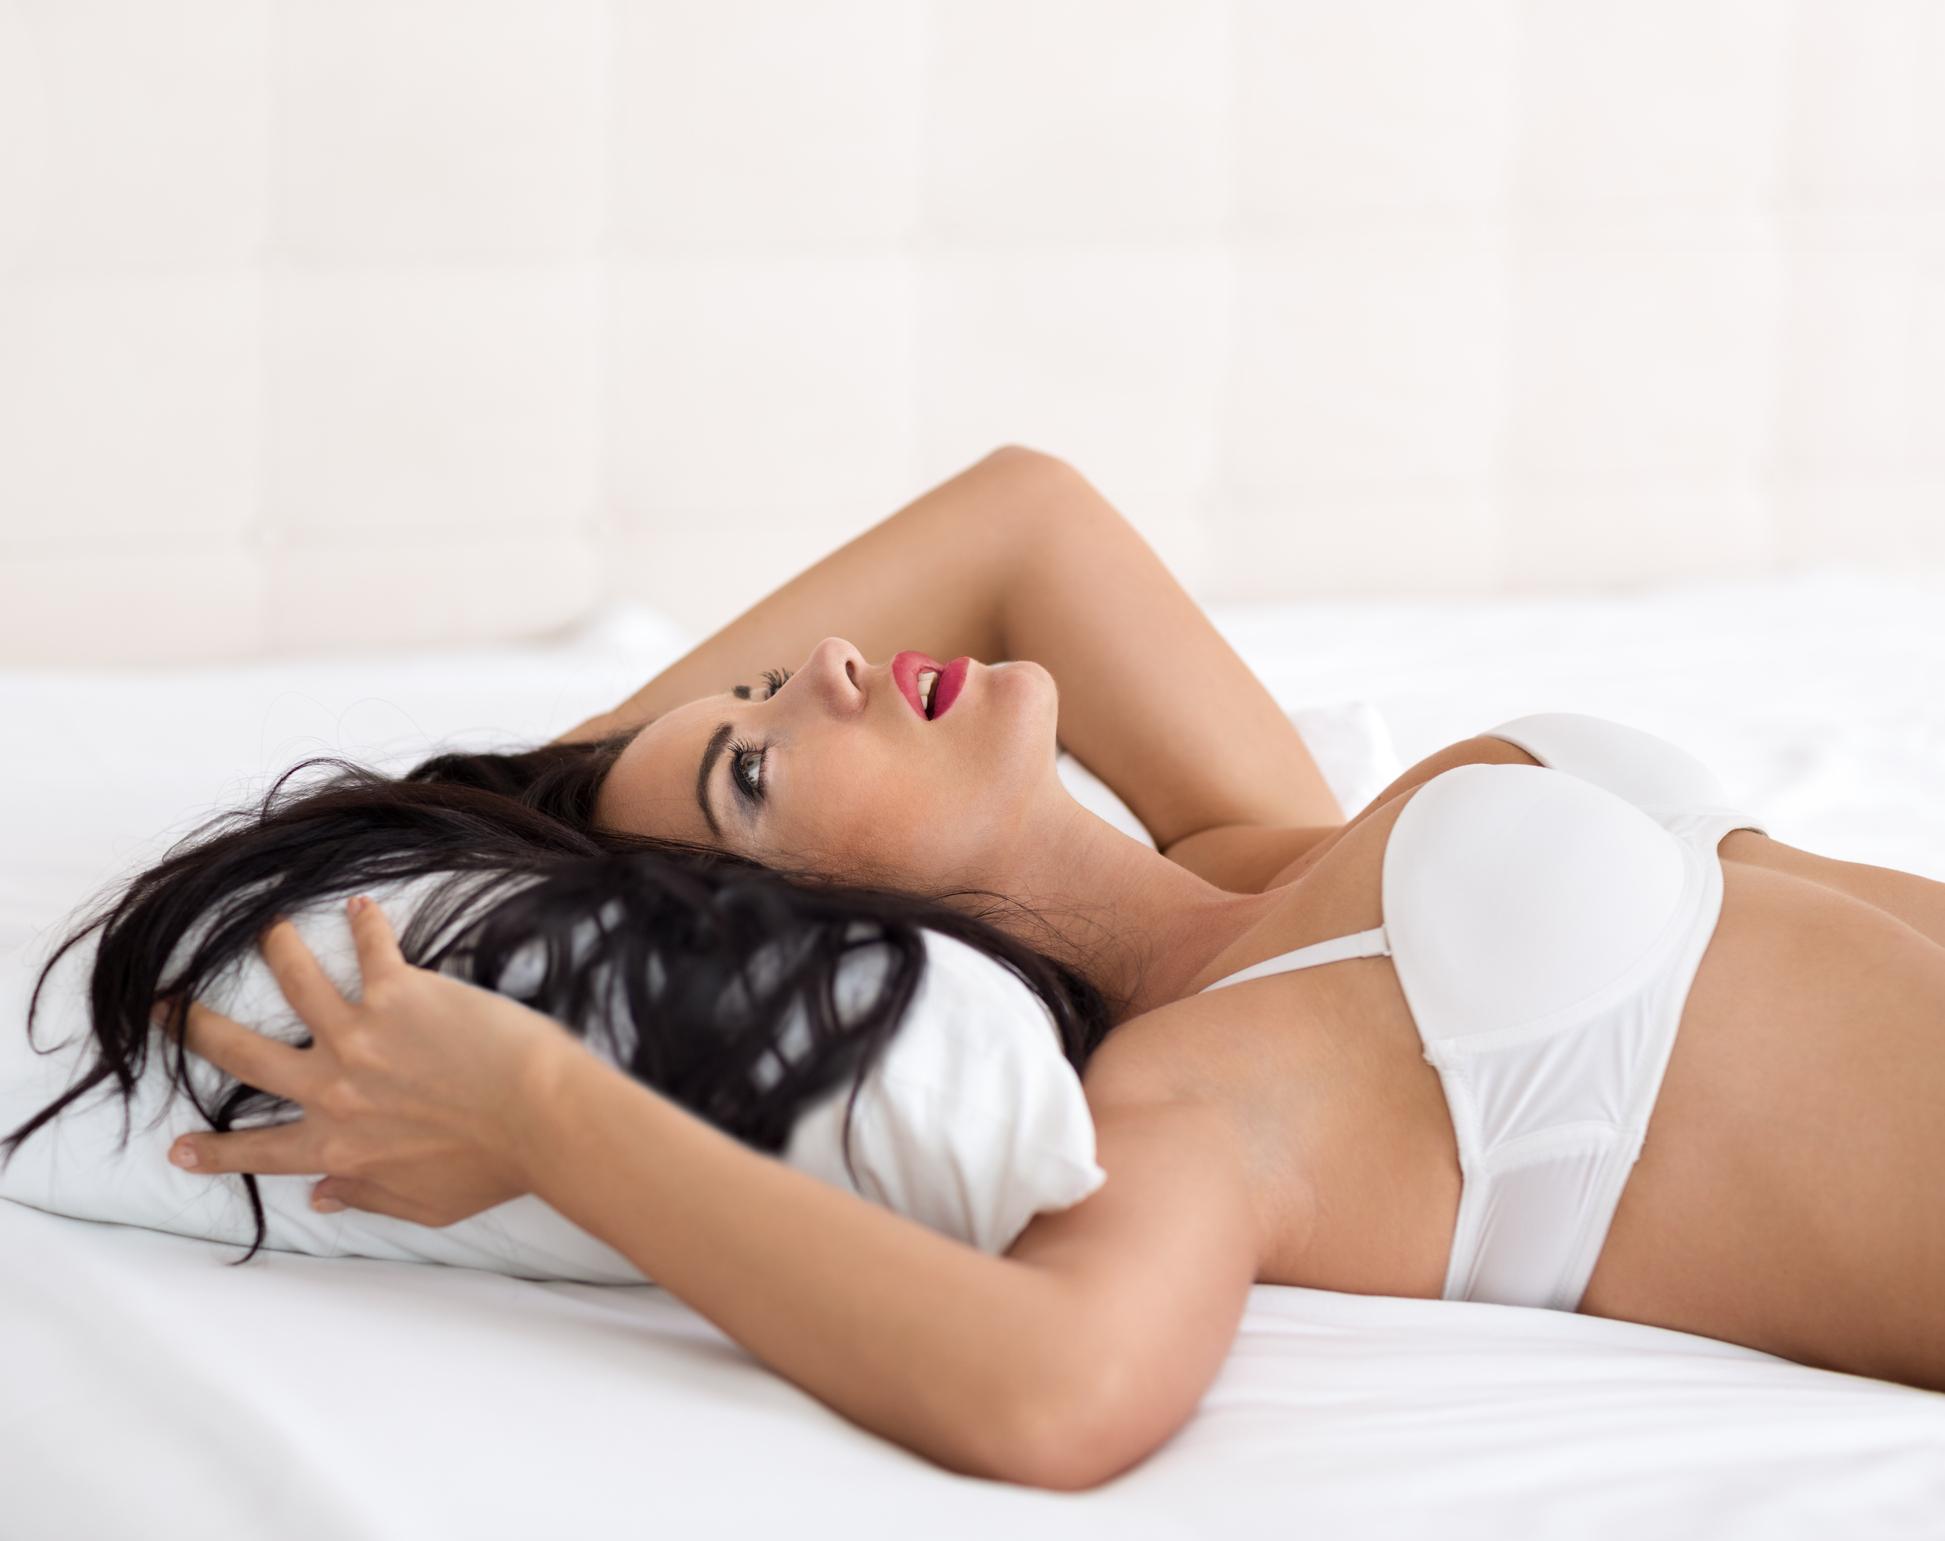 Prstoklad sex video